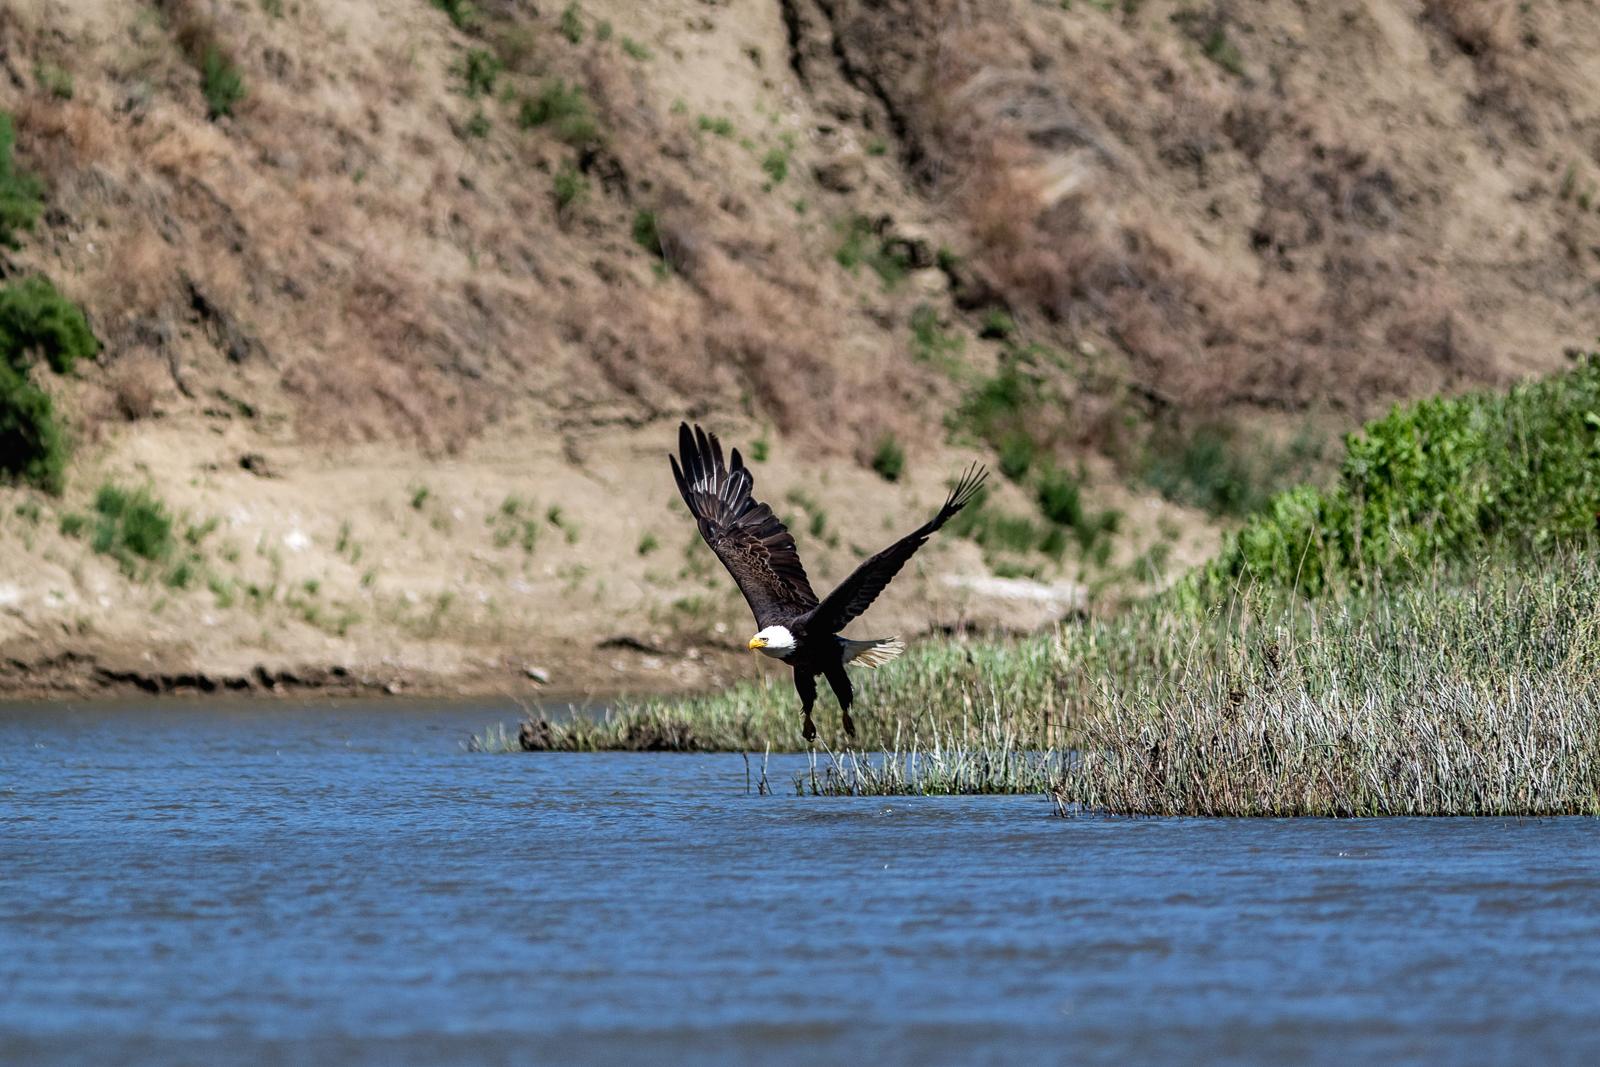 Bald Eagle Takeoff, Upper Missouri River Breaks, MT